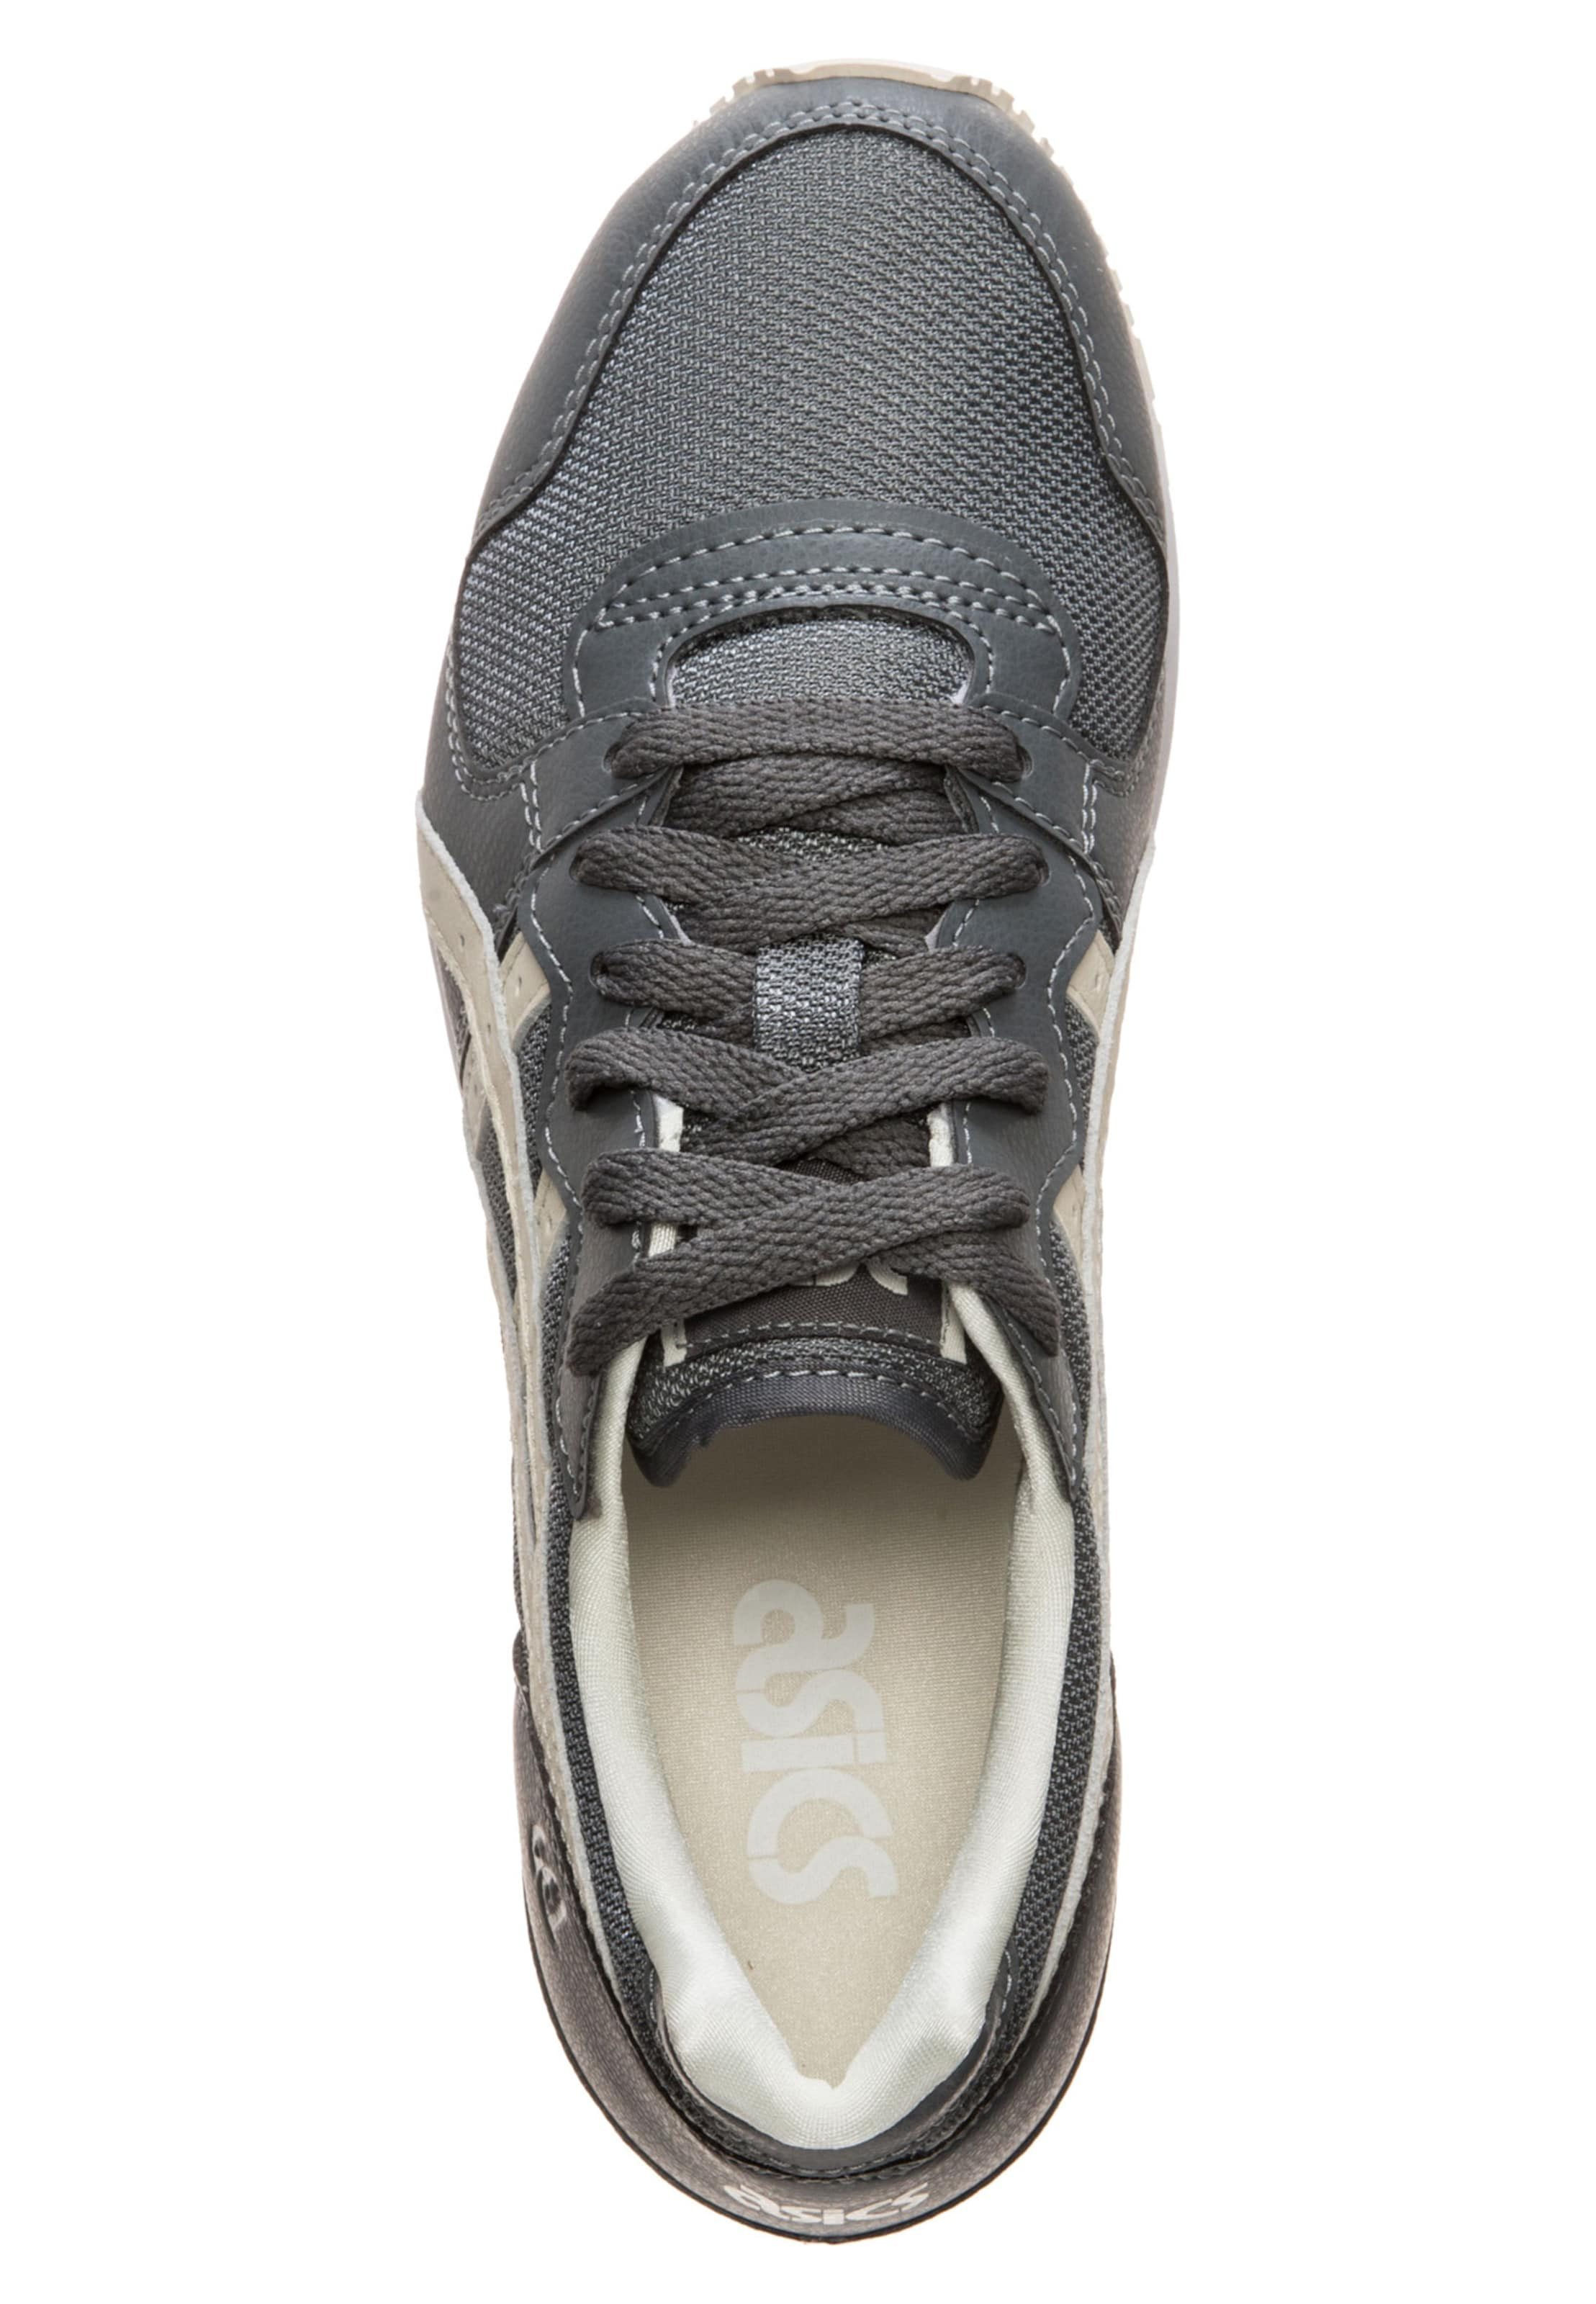 Tiger Asics movimentum' CremeDunkelgrau 'gel Sneaker In vmN0nw8